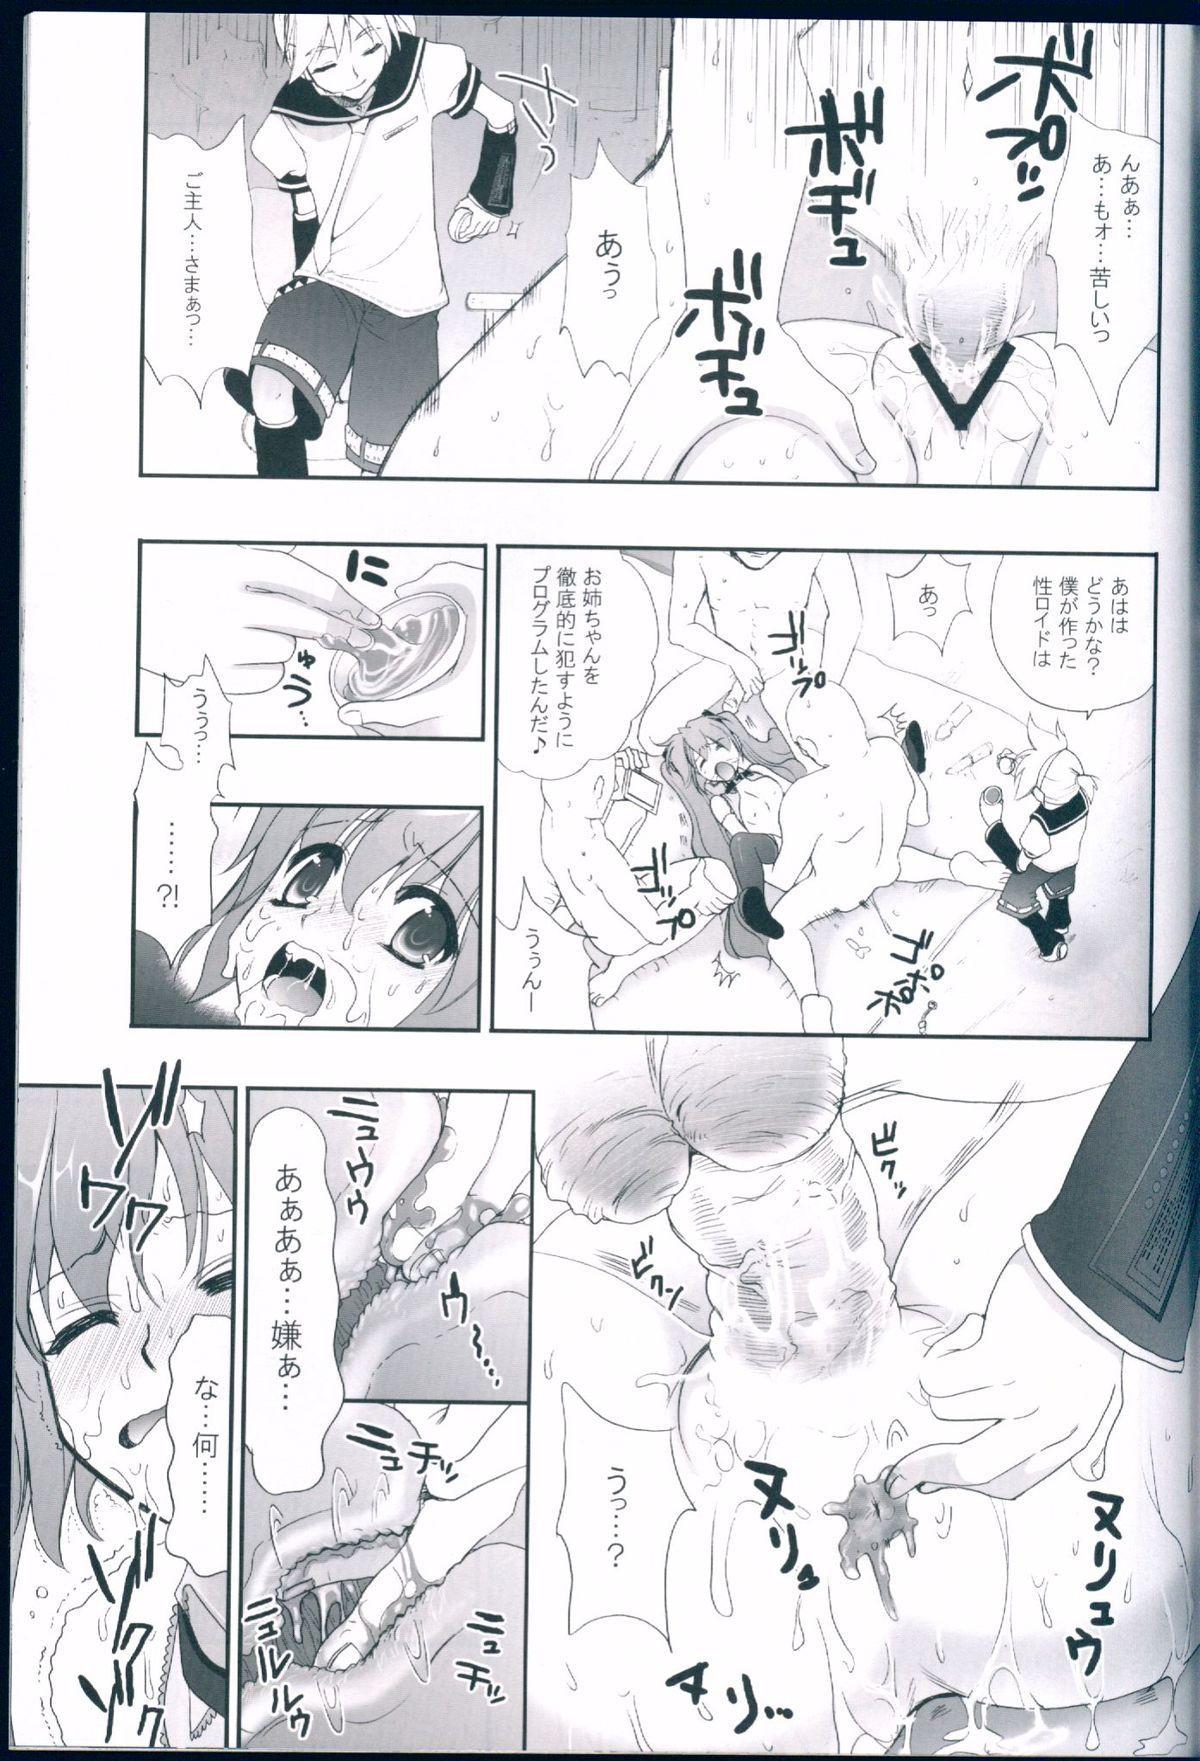 R Juu - Hatsune Miku Kenkan 10